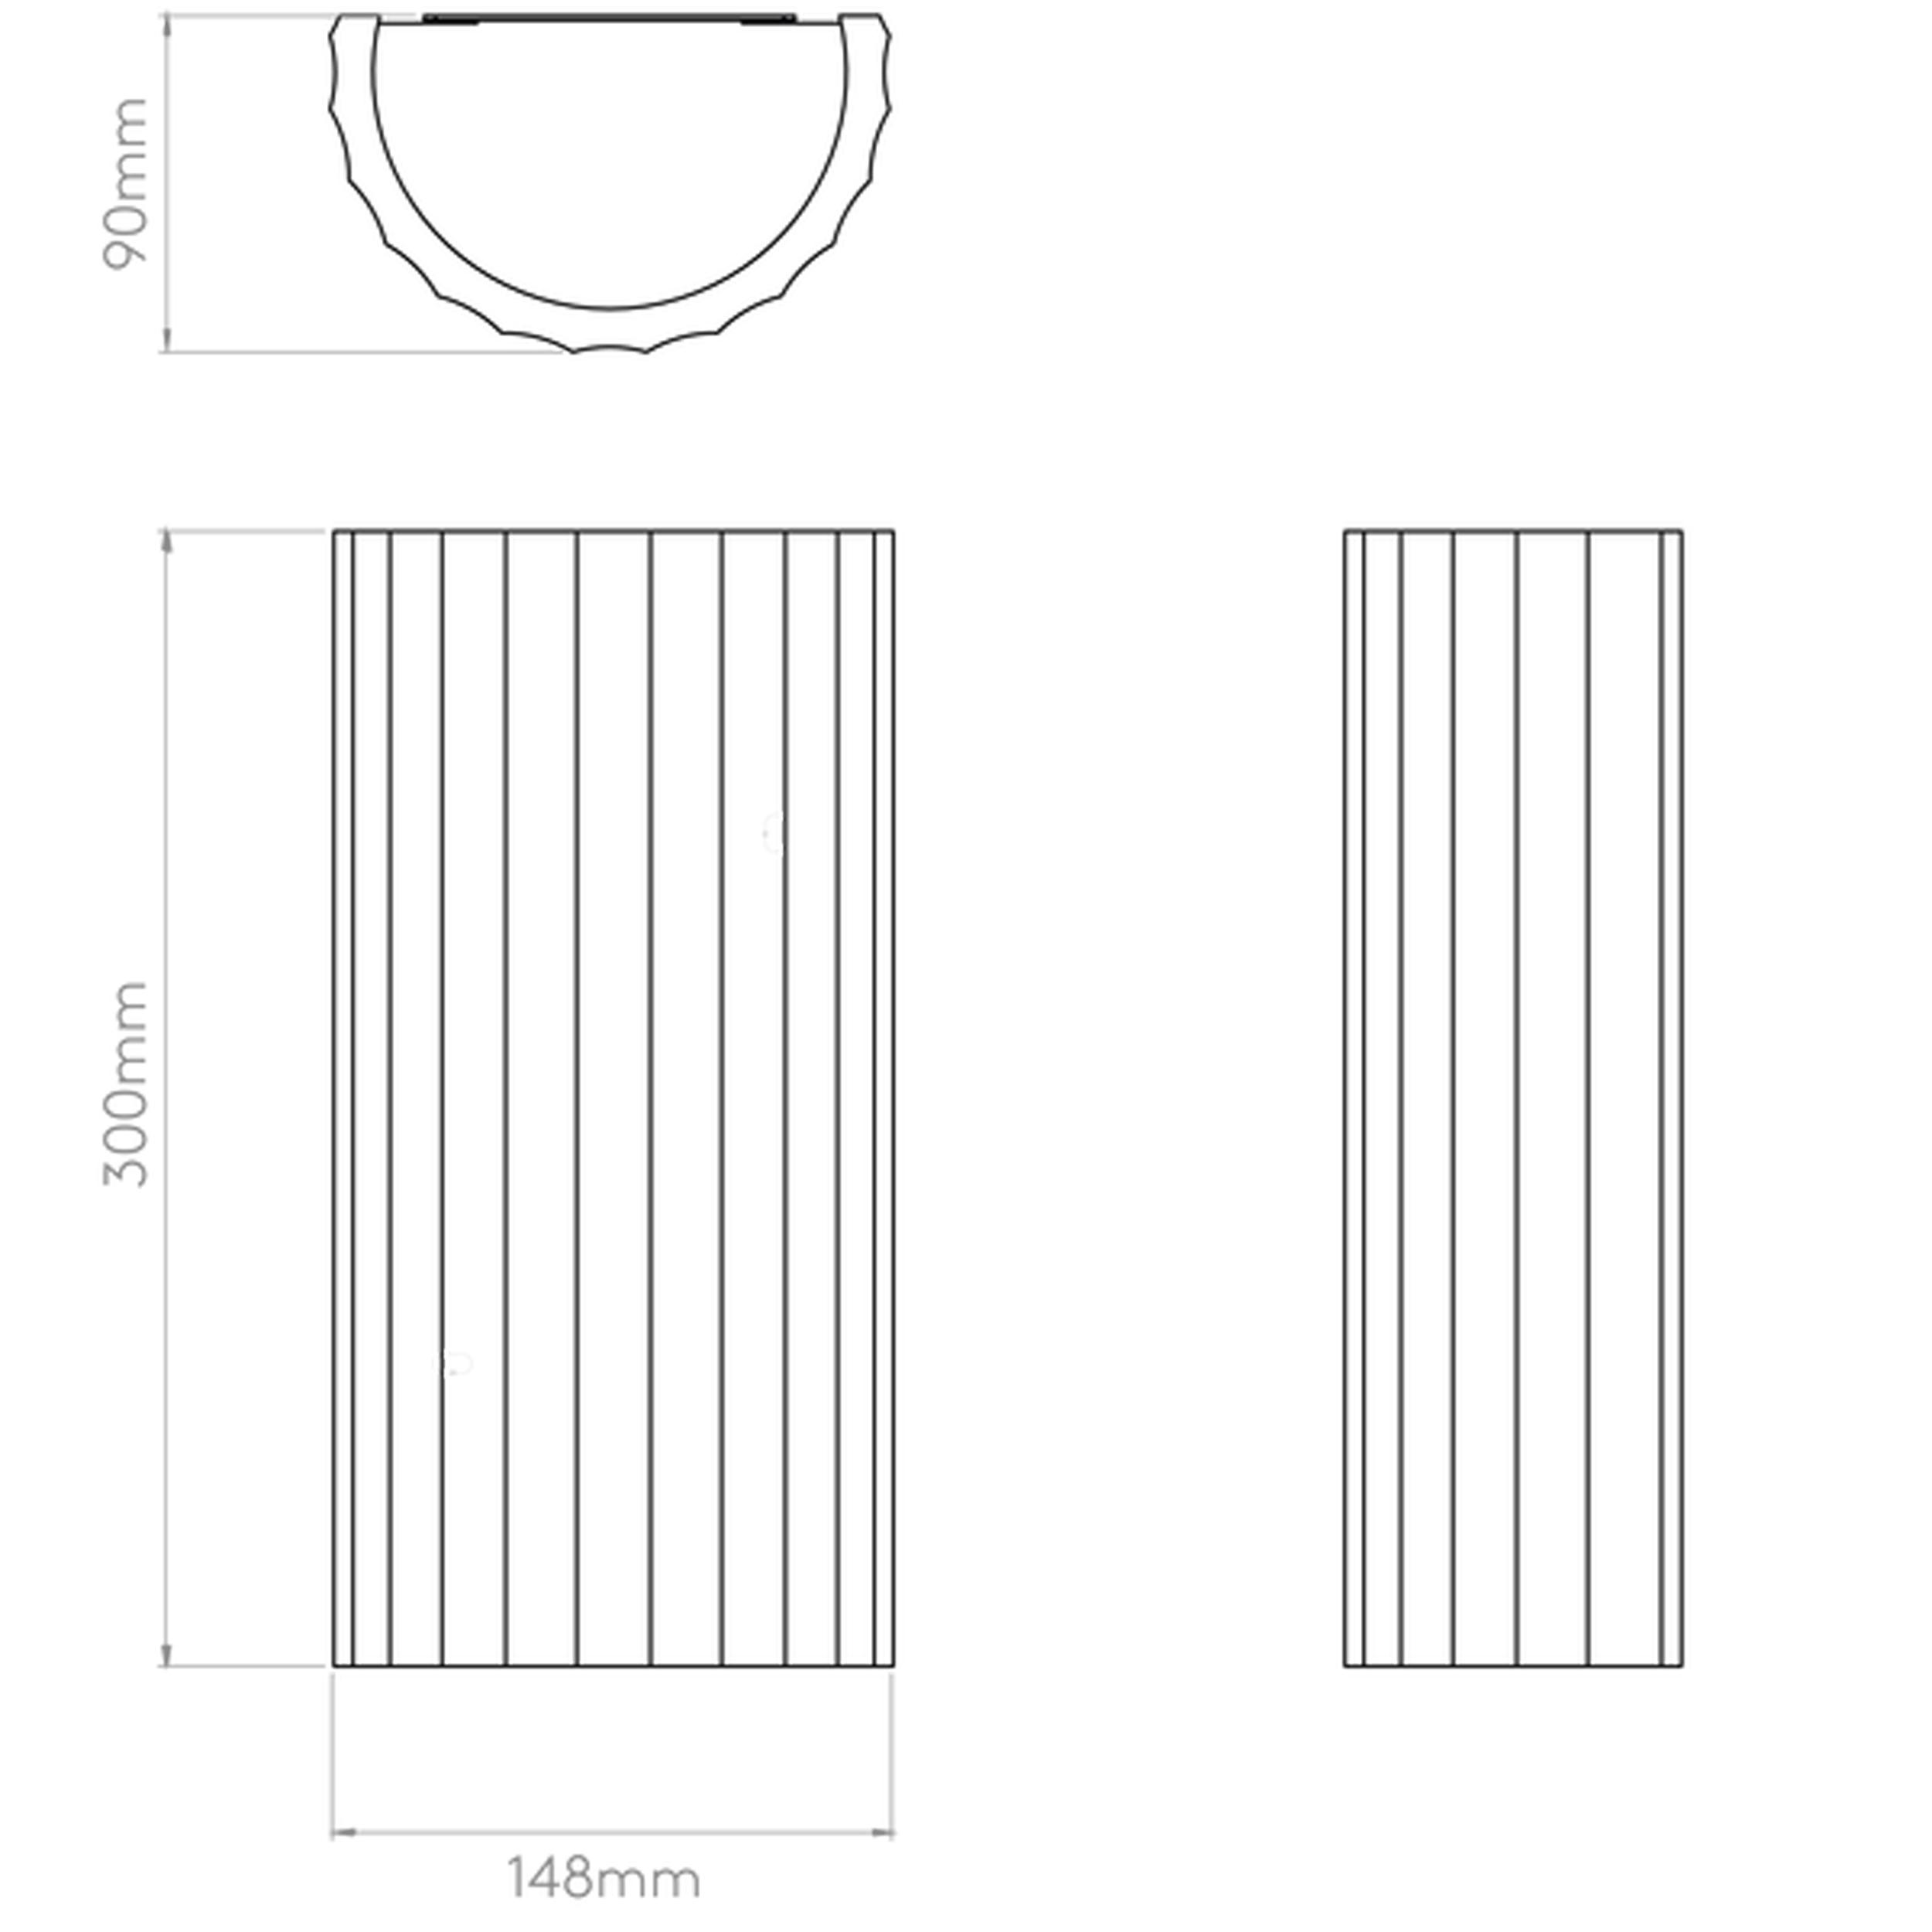 Astro Kymi 300 Wall Light Line Drawing